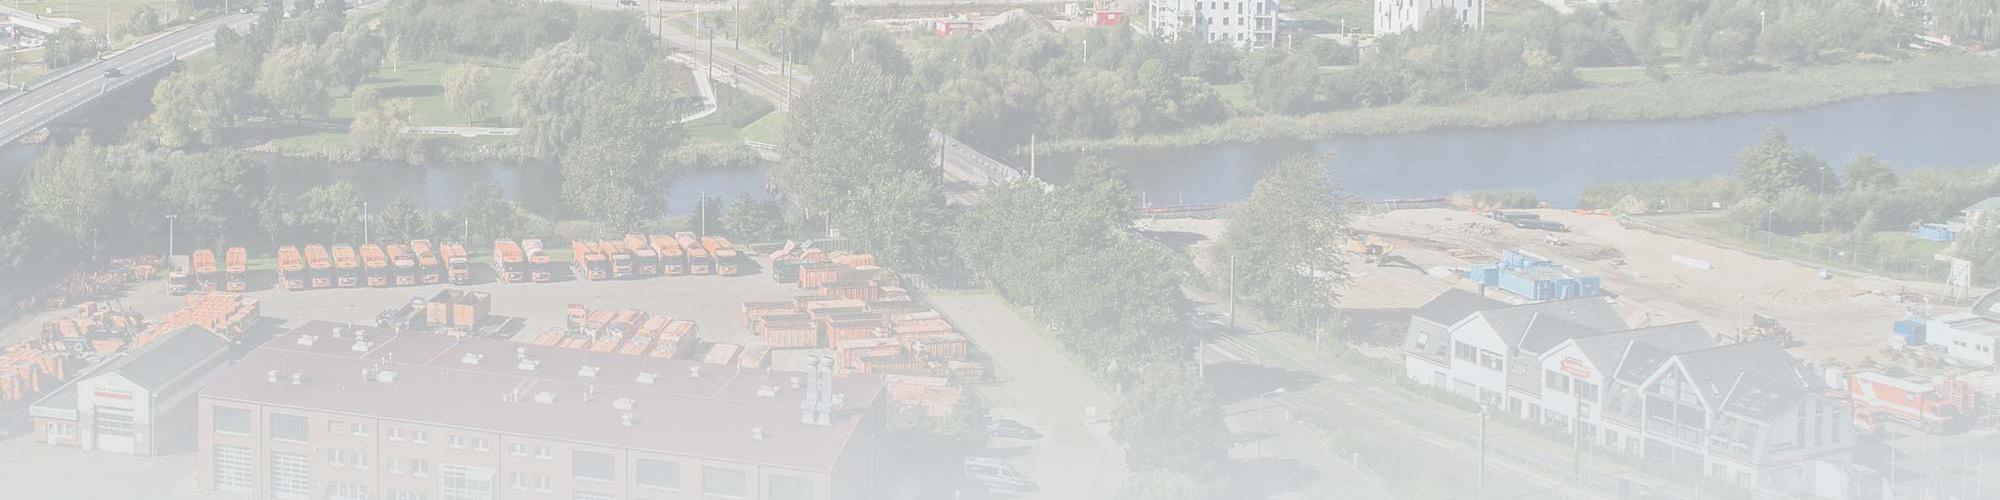 Stadtentsorgung Rostock GmbH